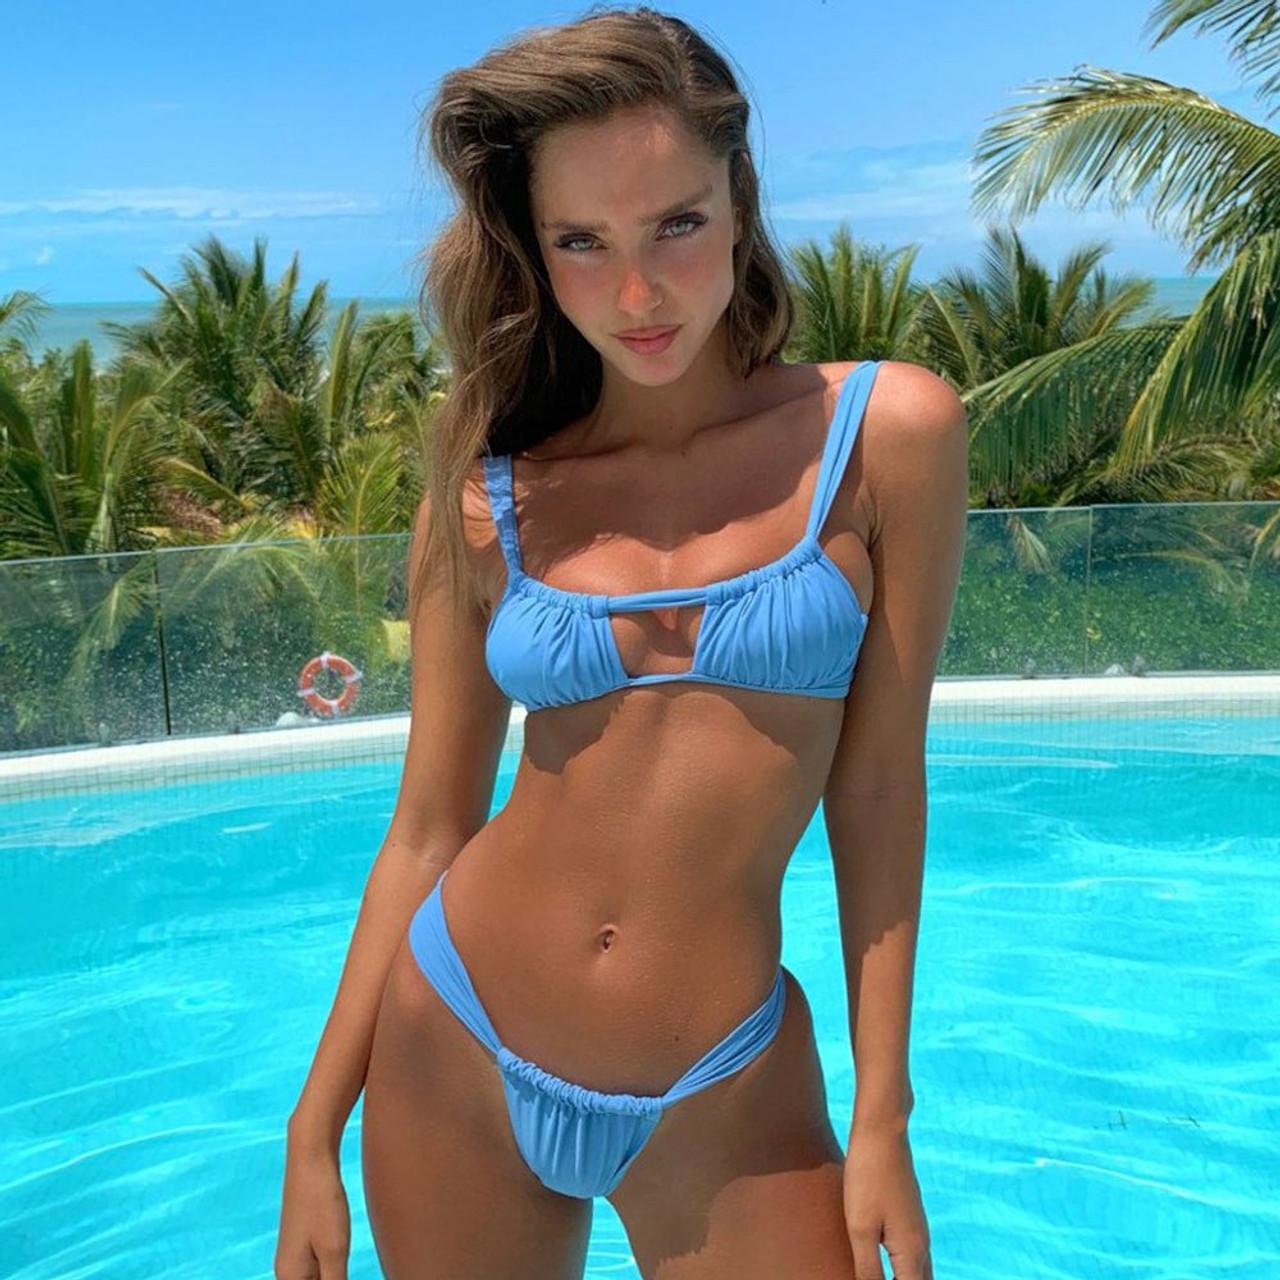 20d14dc17a0ea New Bikini Set 2019 Women Swimsuit Sexy Swimwear Female Striped Thong  Beachwear Summer Bathing Suit Maillot De Bain Biquini Swim